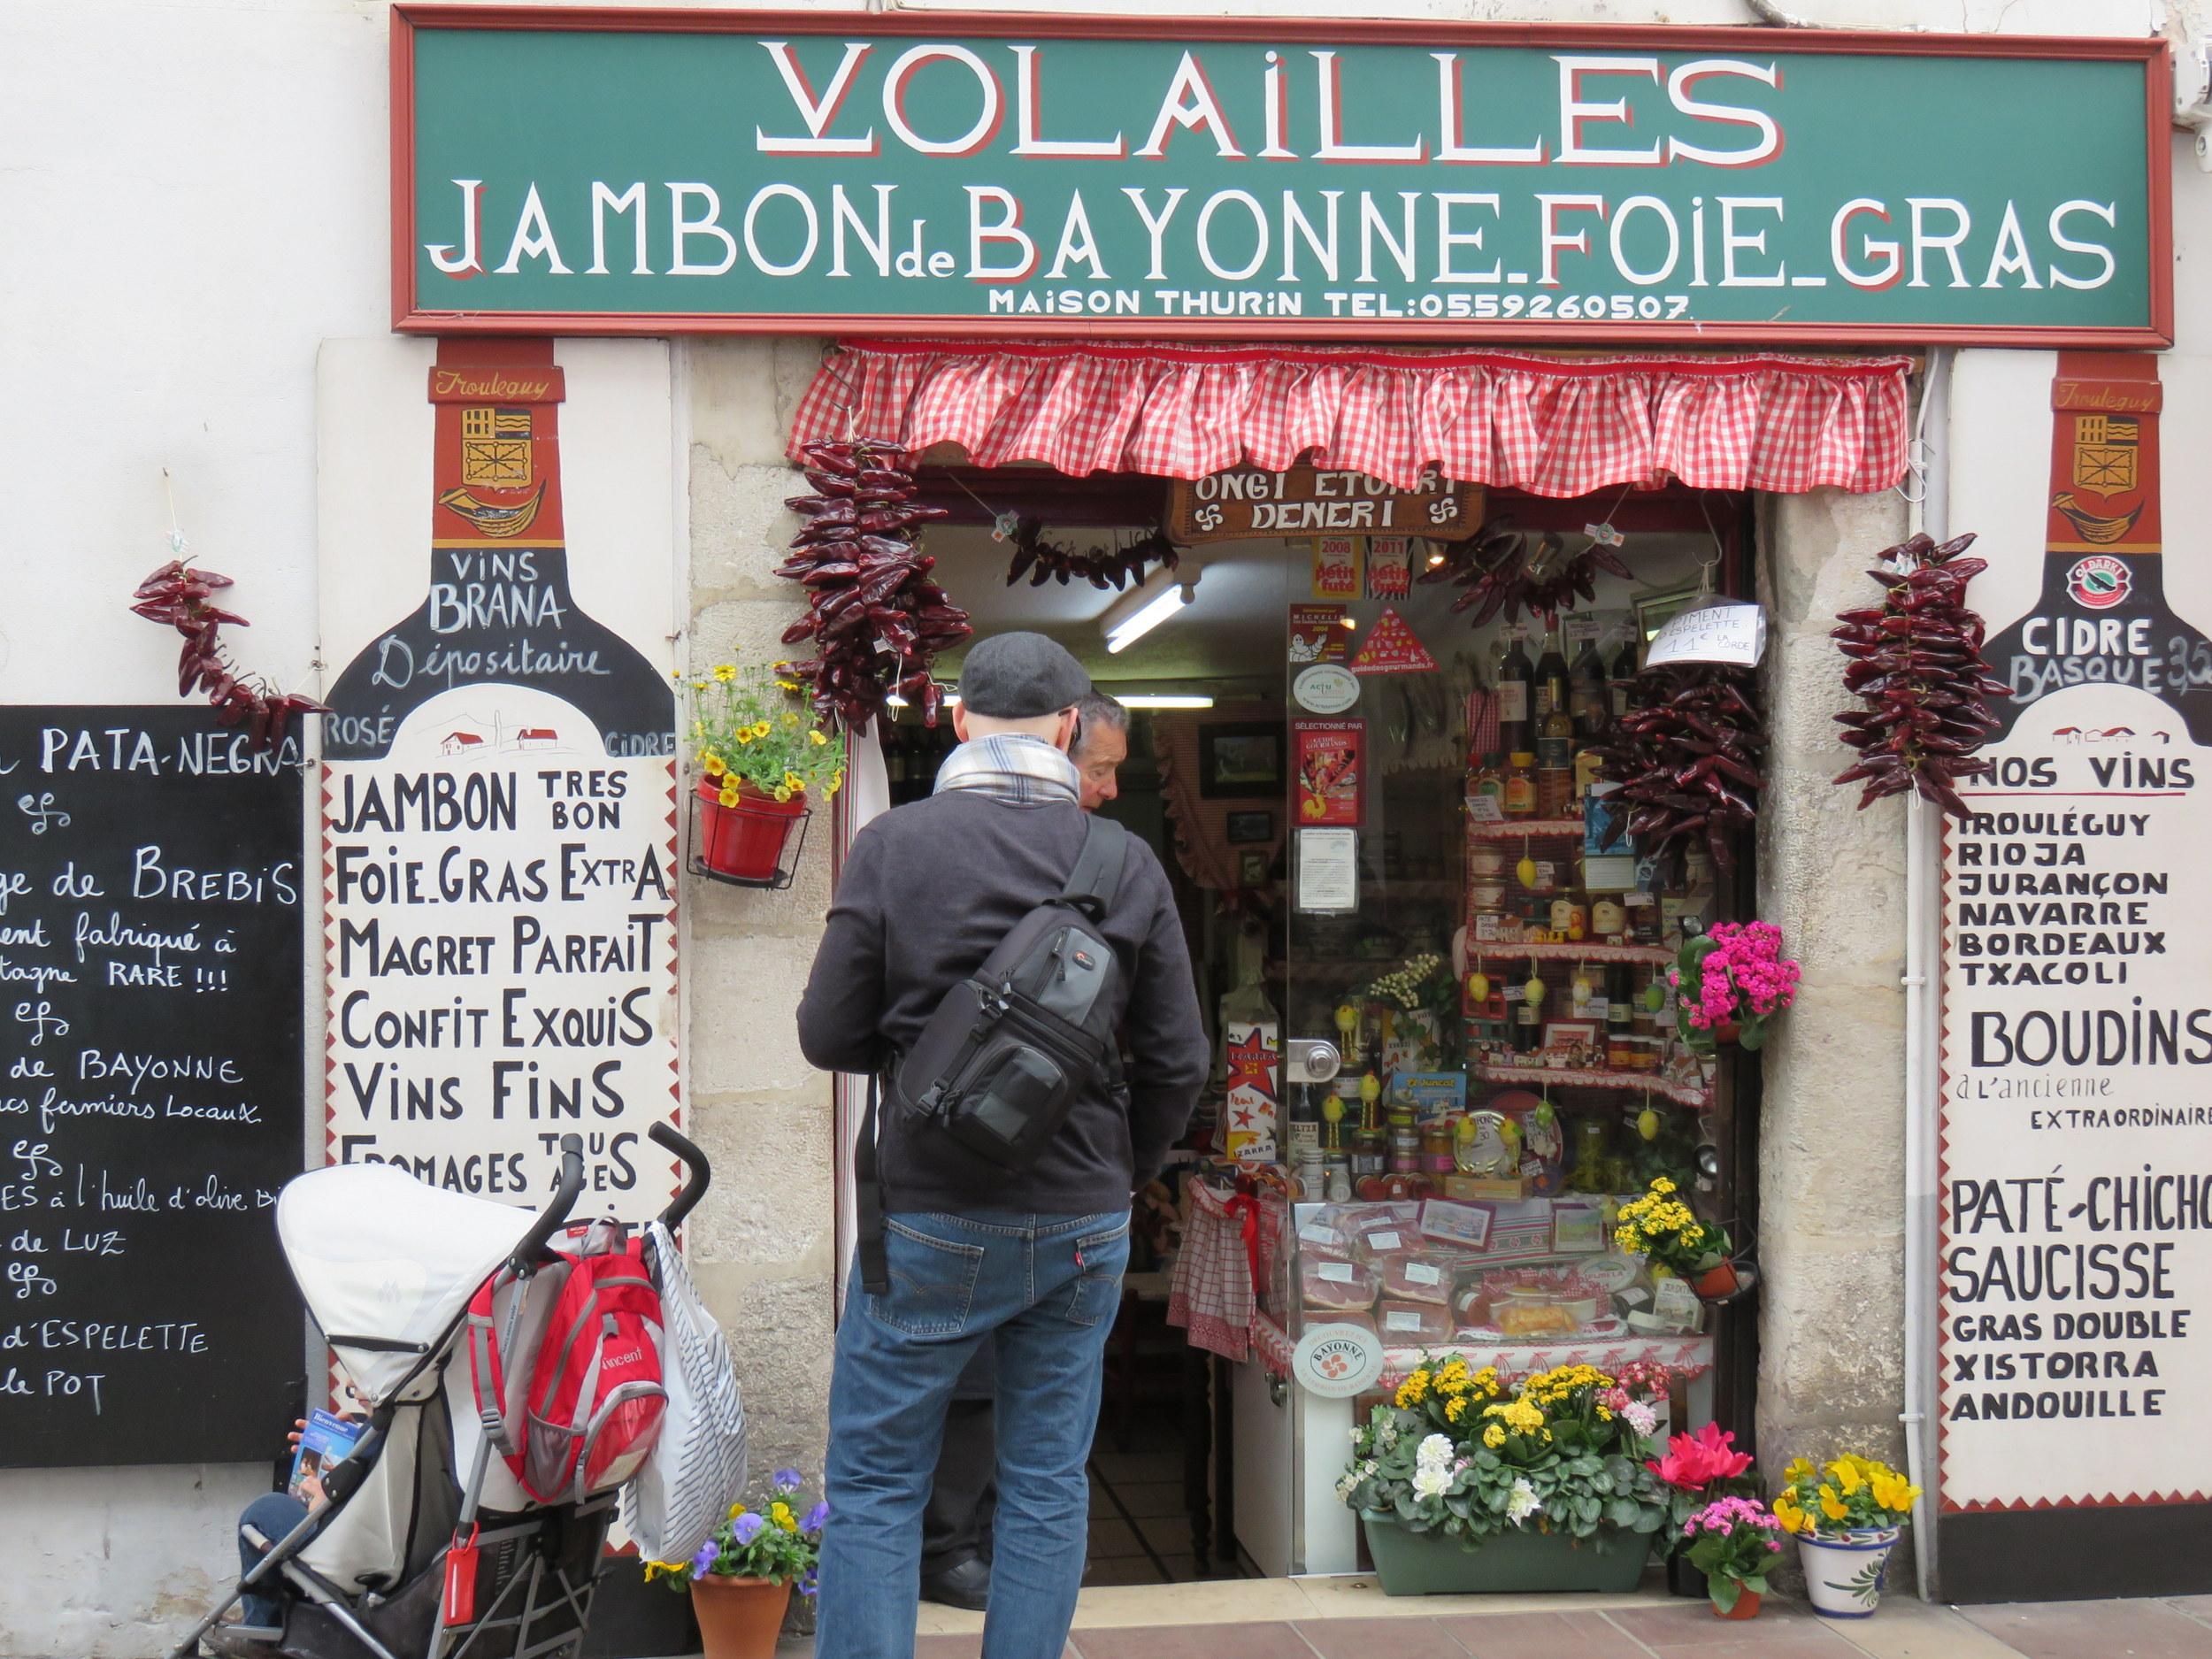 Maison Thurin, purveyor of Basque specialities from a tiny shop on the main pedestrian street in Saint-Jean-de-Luz. (32, rue Gambetta, 05 59 26 05 07)